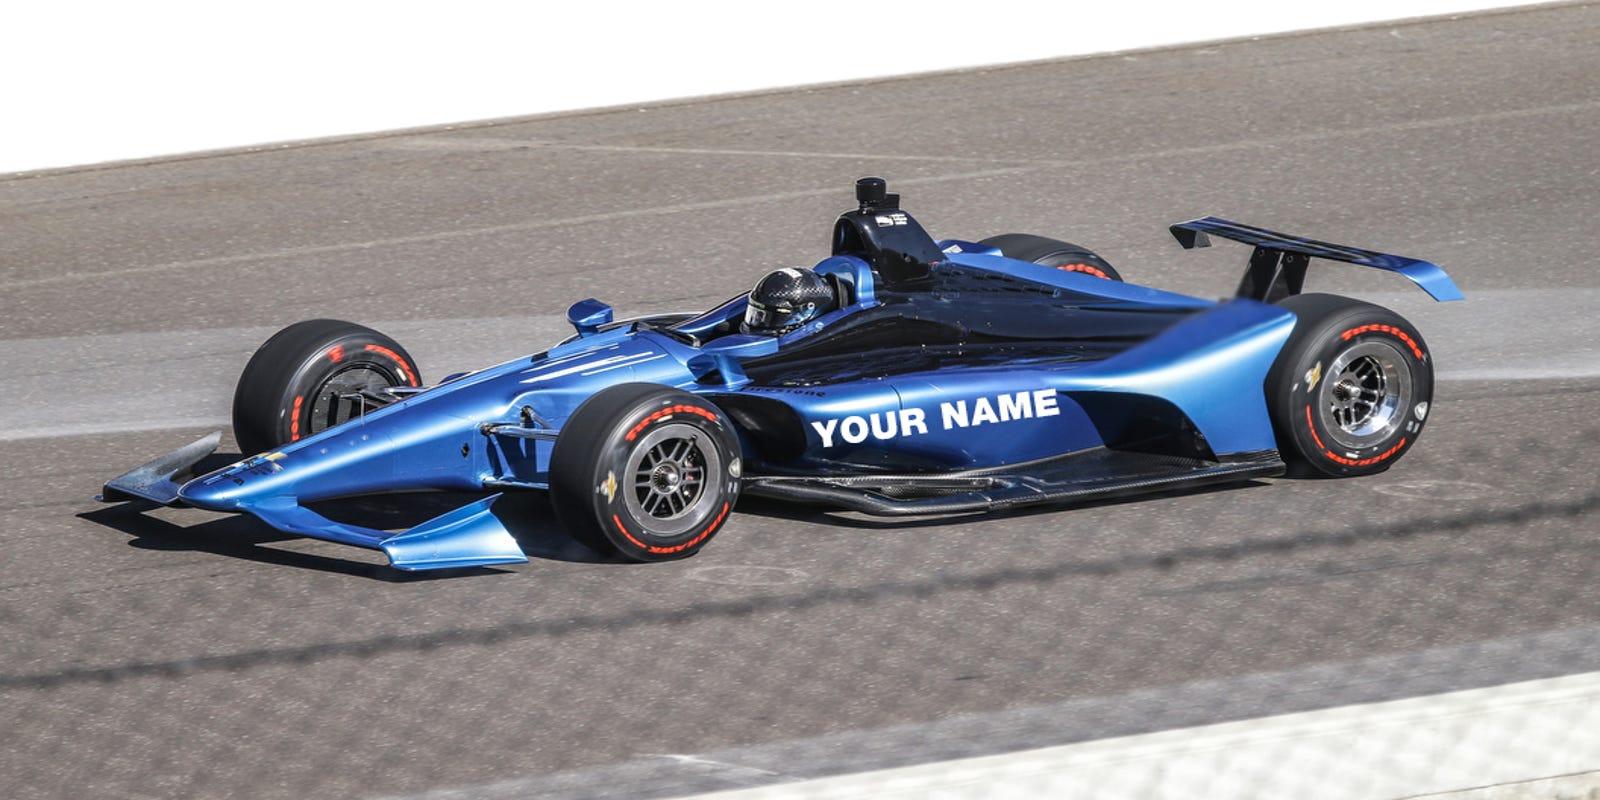 F1 Car Horsepower 2018